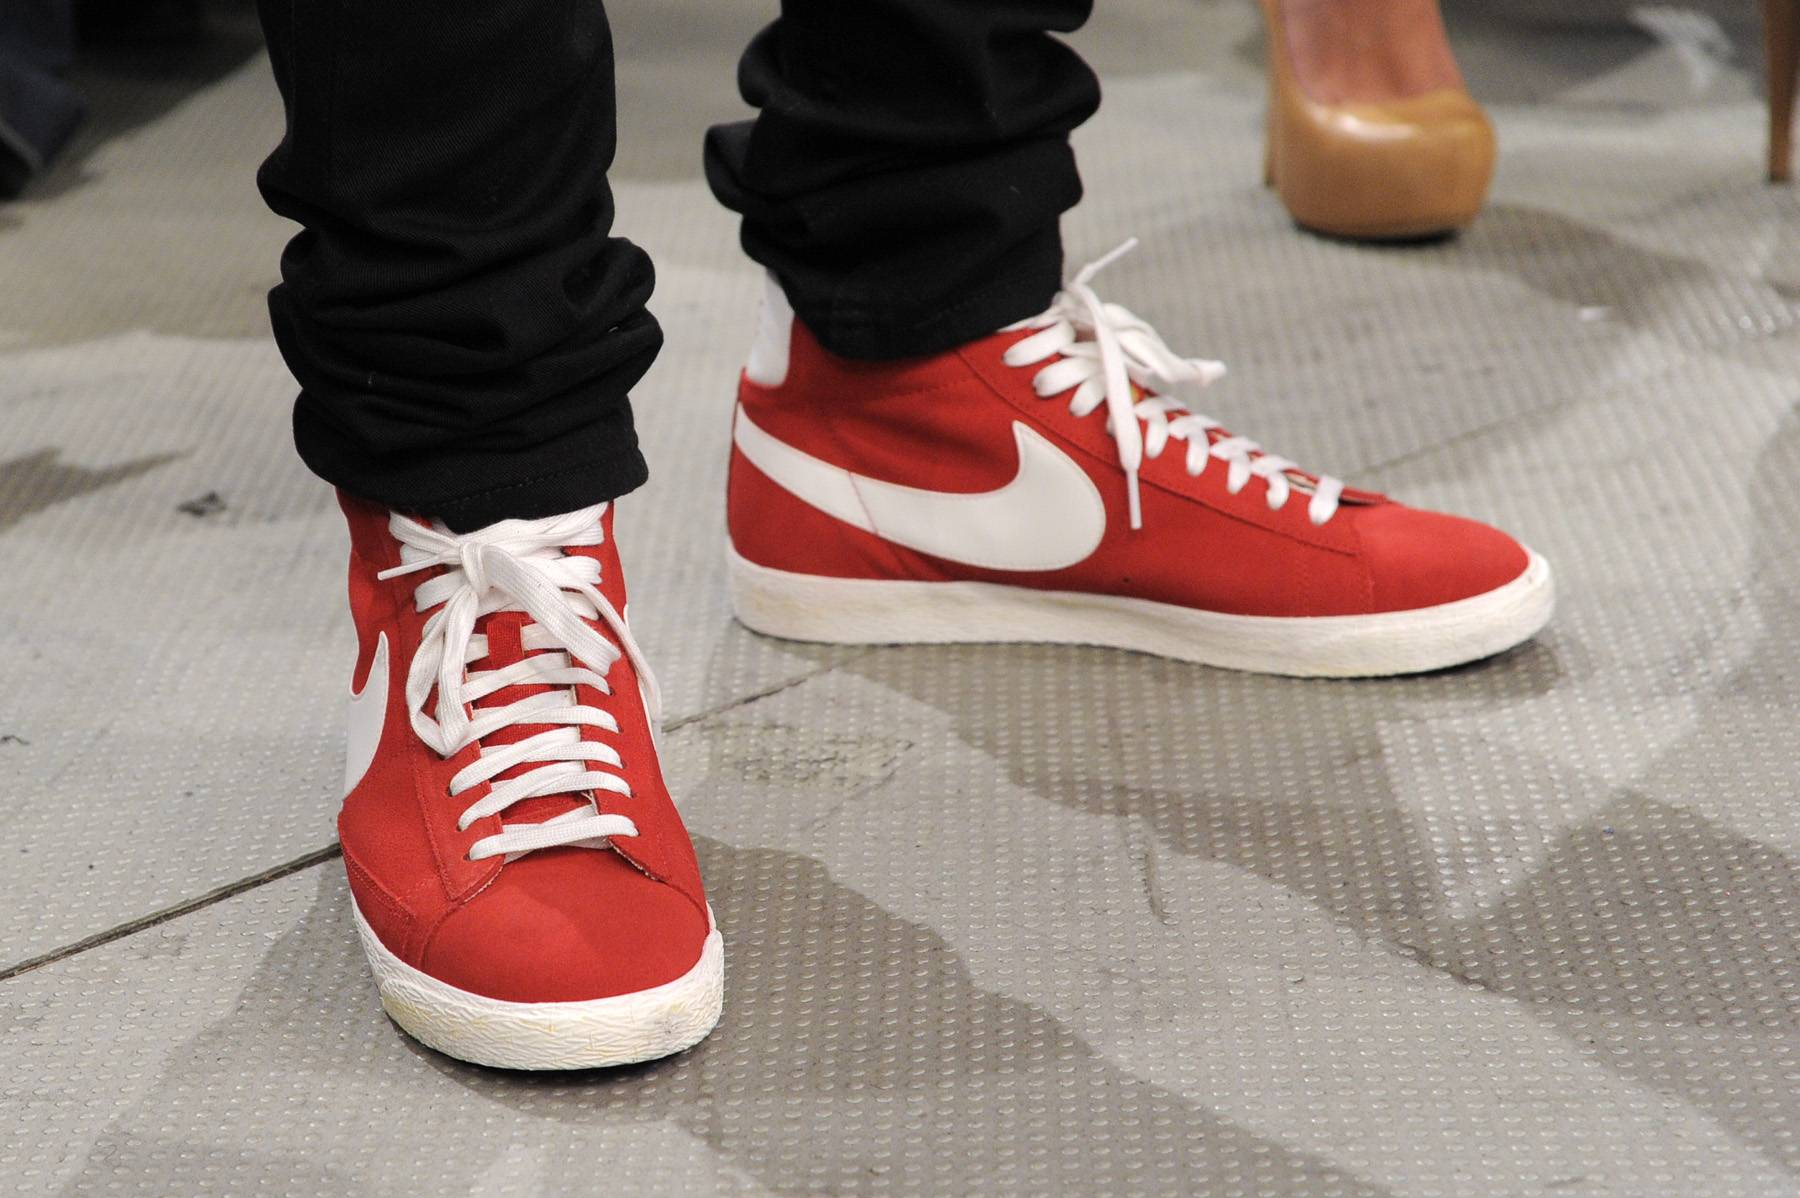 Cool Kicks Bro - Bow Wow at 106 & Park, January 23, 2012. (Photo: John Ricard / BET)